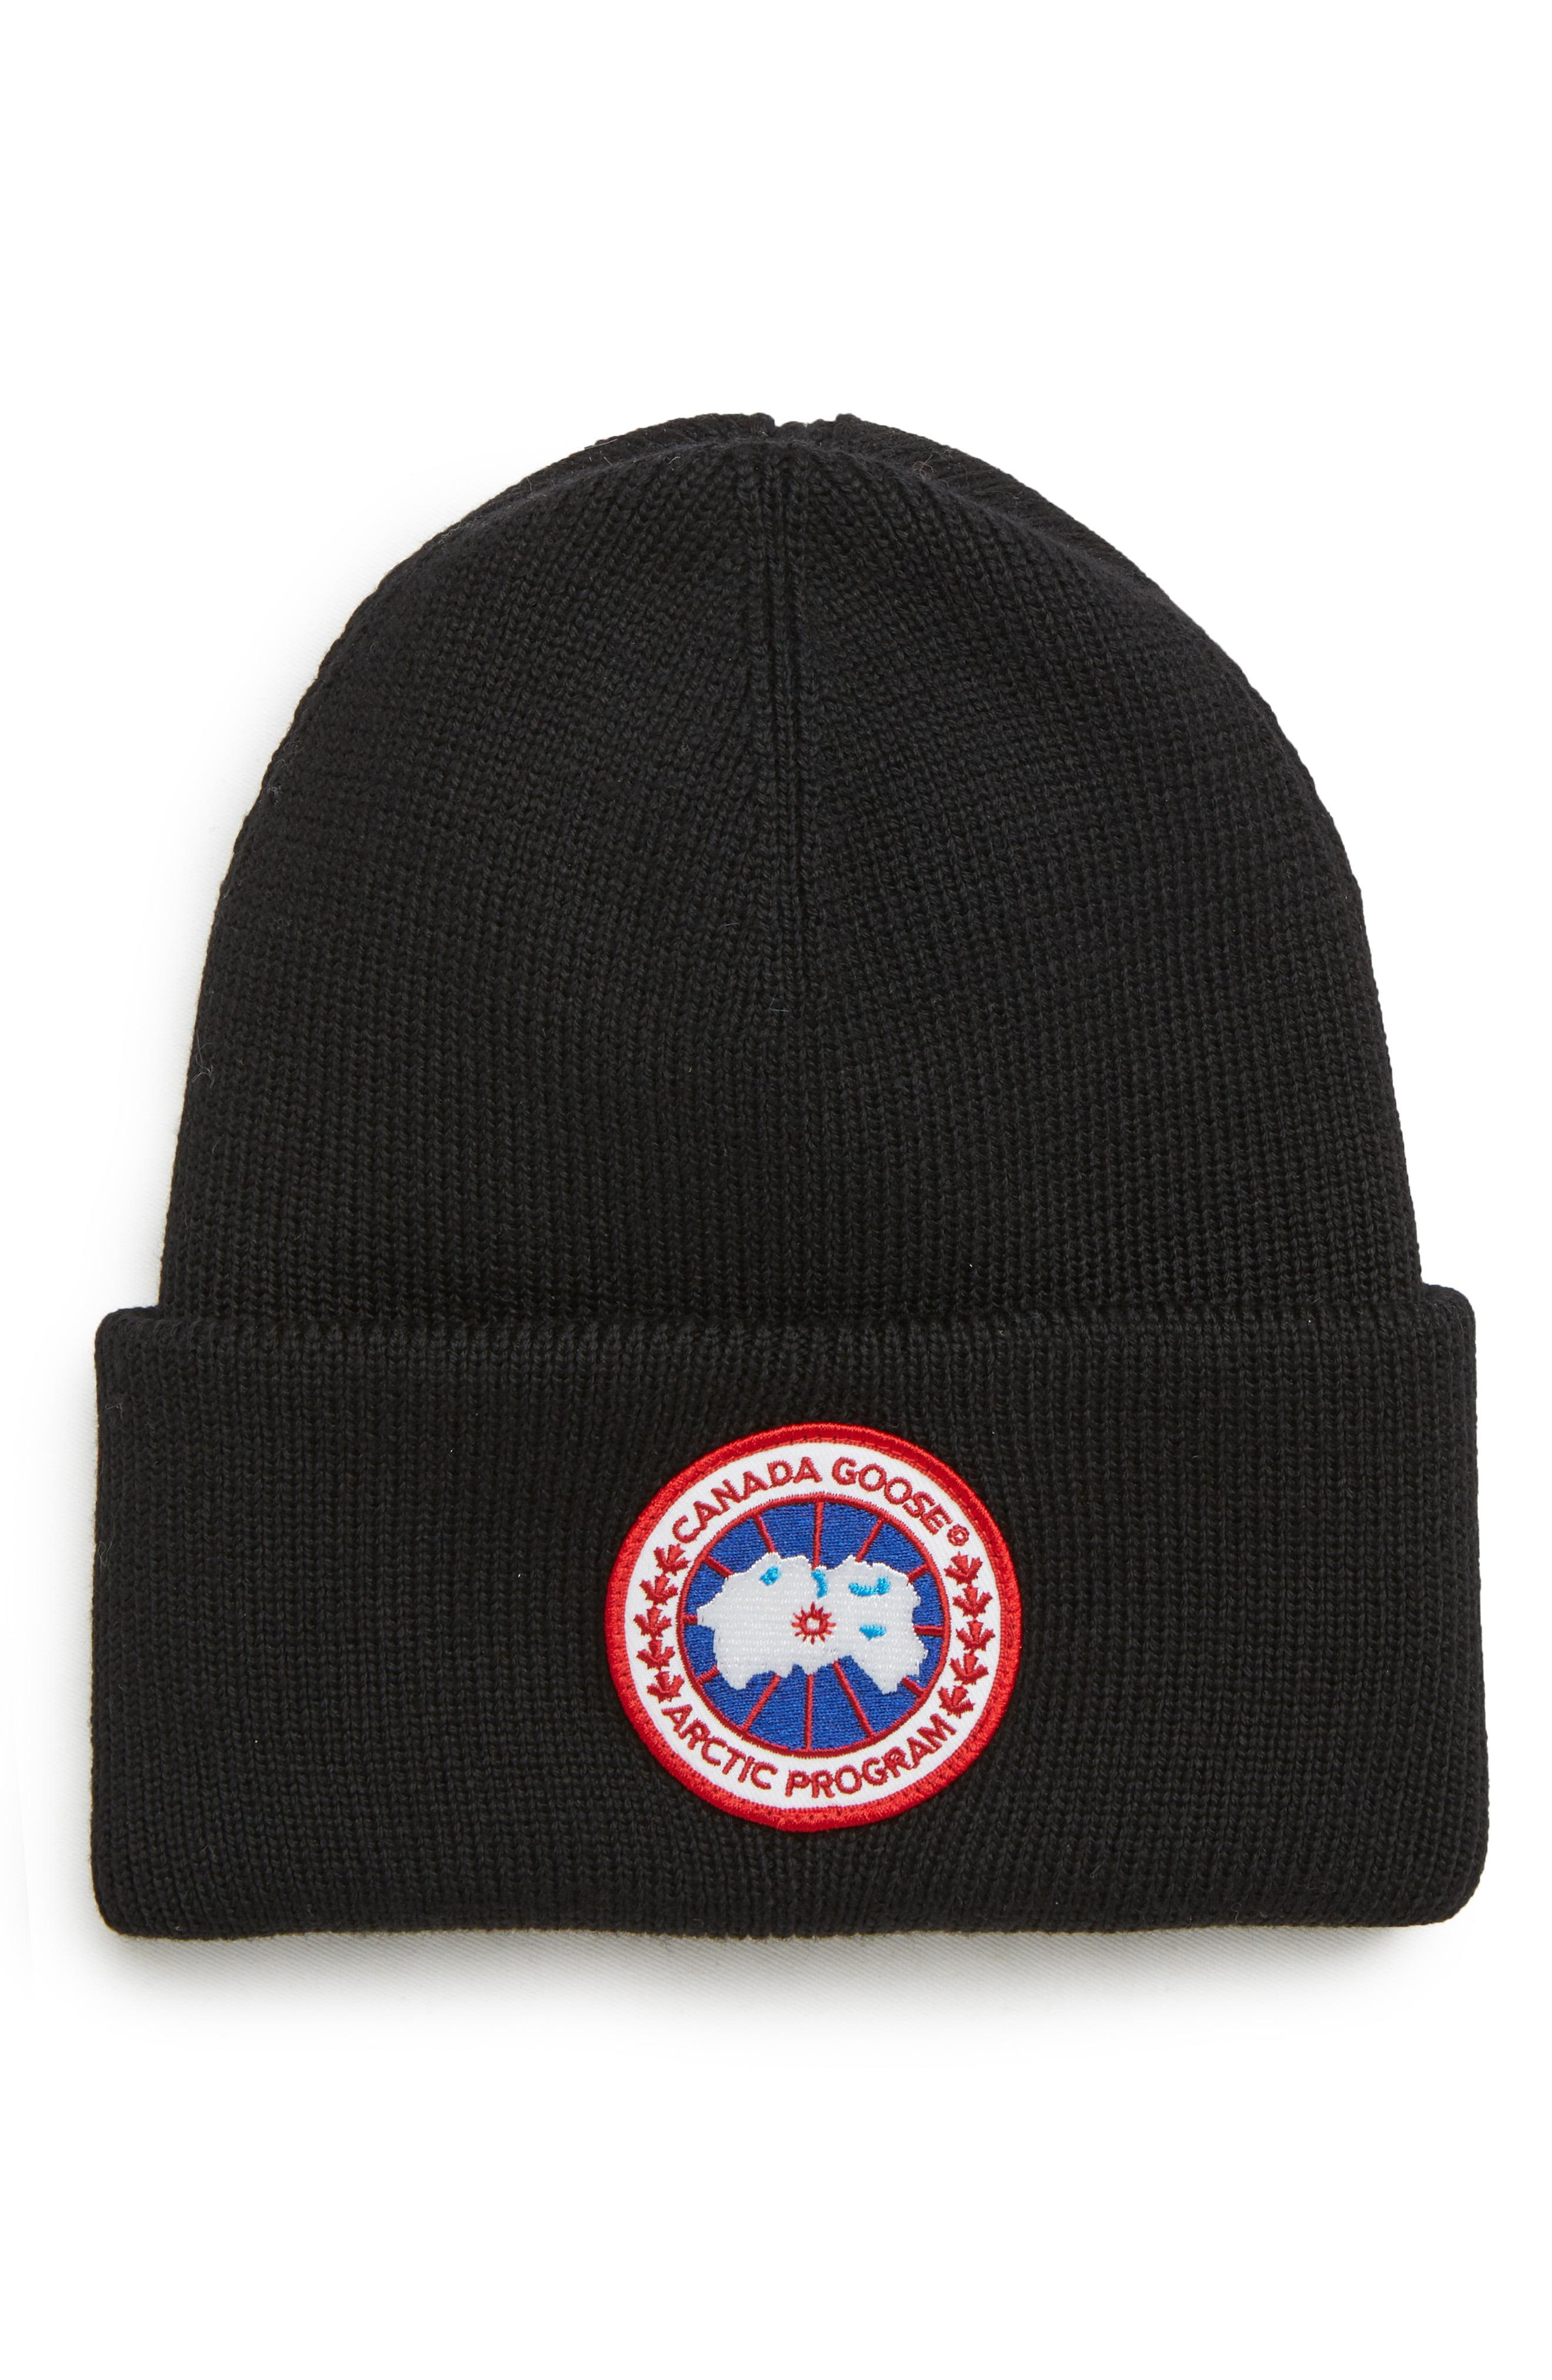 5fb57060d5f Canada Goose - Black Arctic Disc Wool Beanie for Men - Lyst. View fullscreen